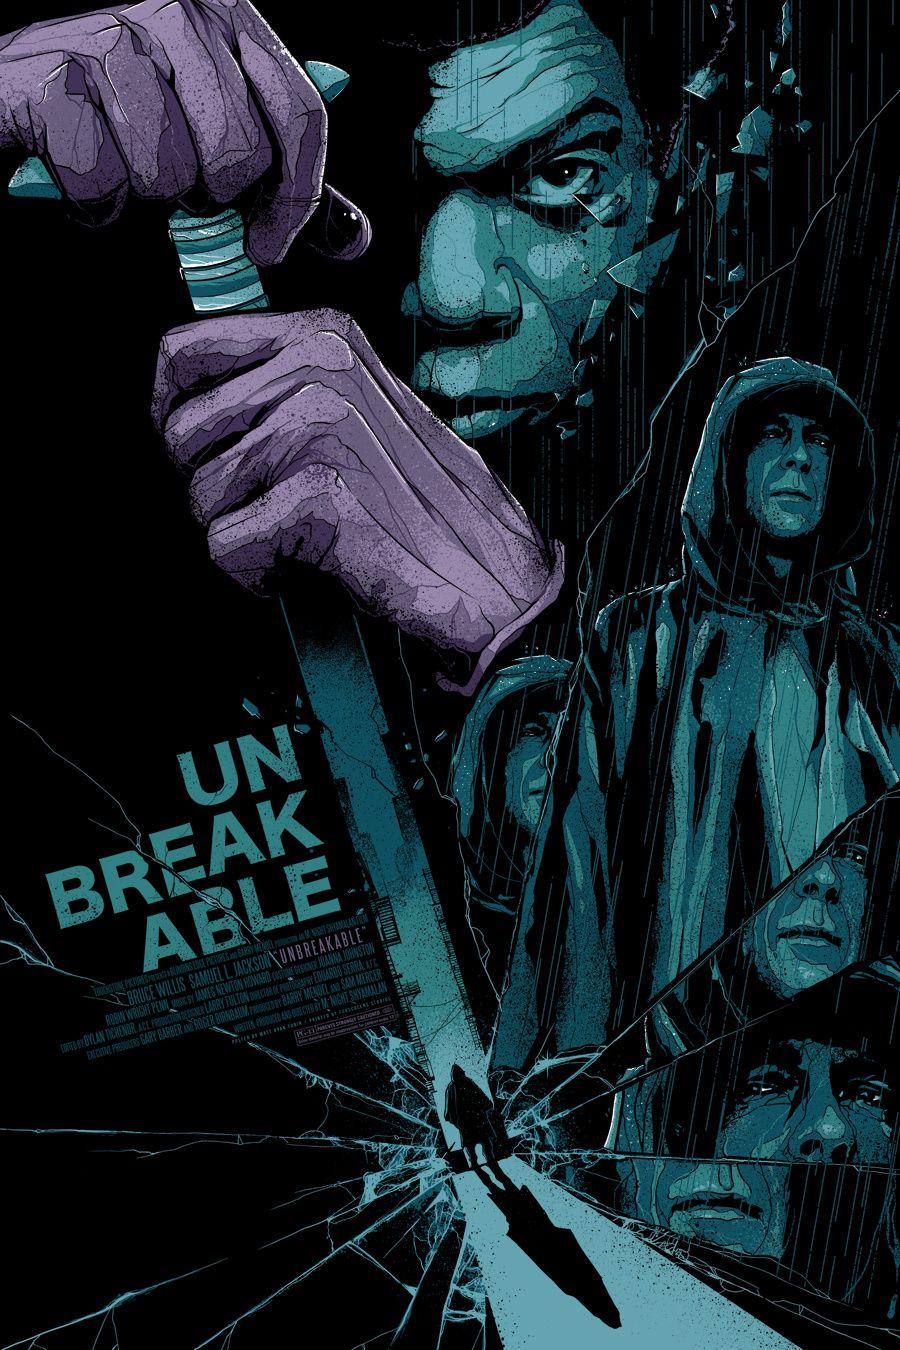 Unbreakable Matt Ryan Tobin Alternative movie posters